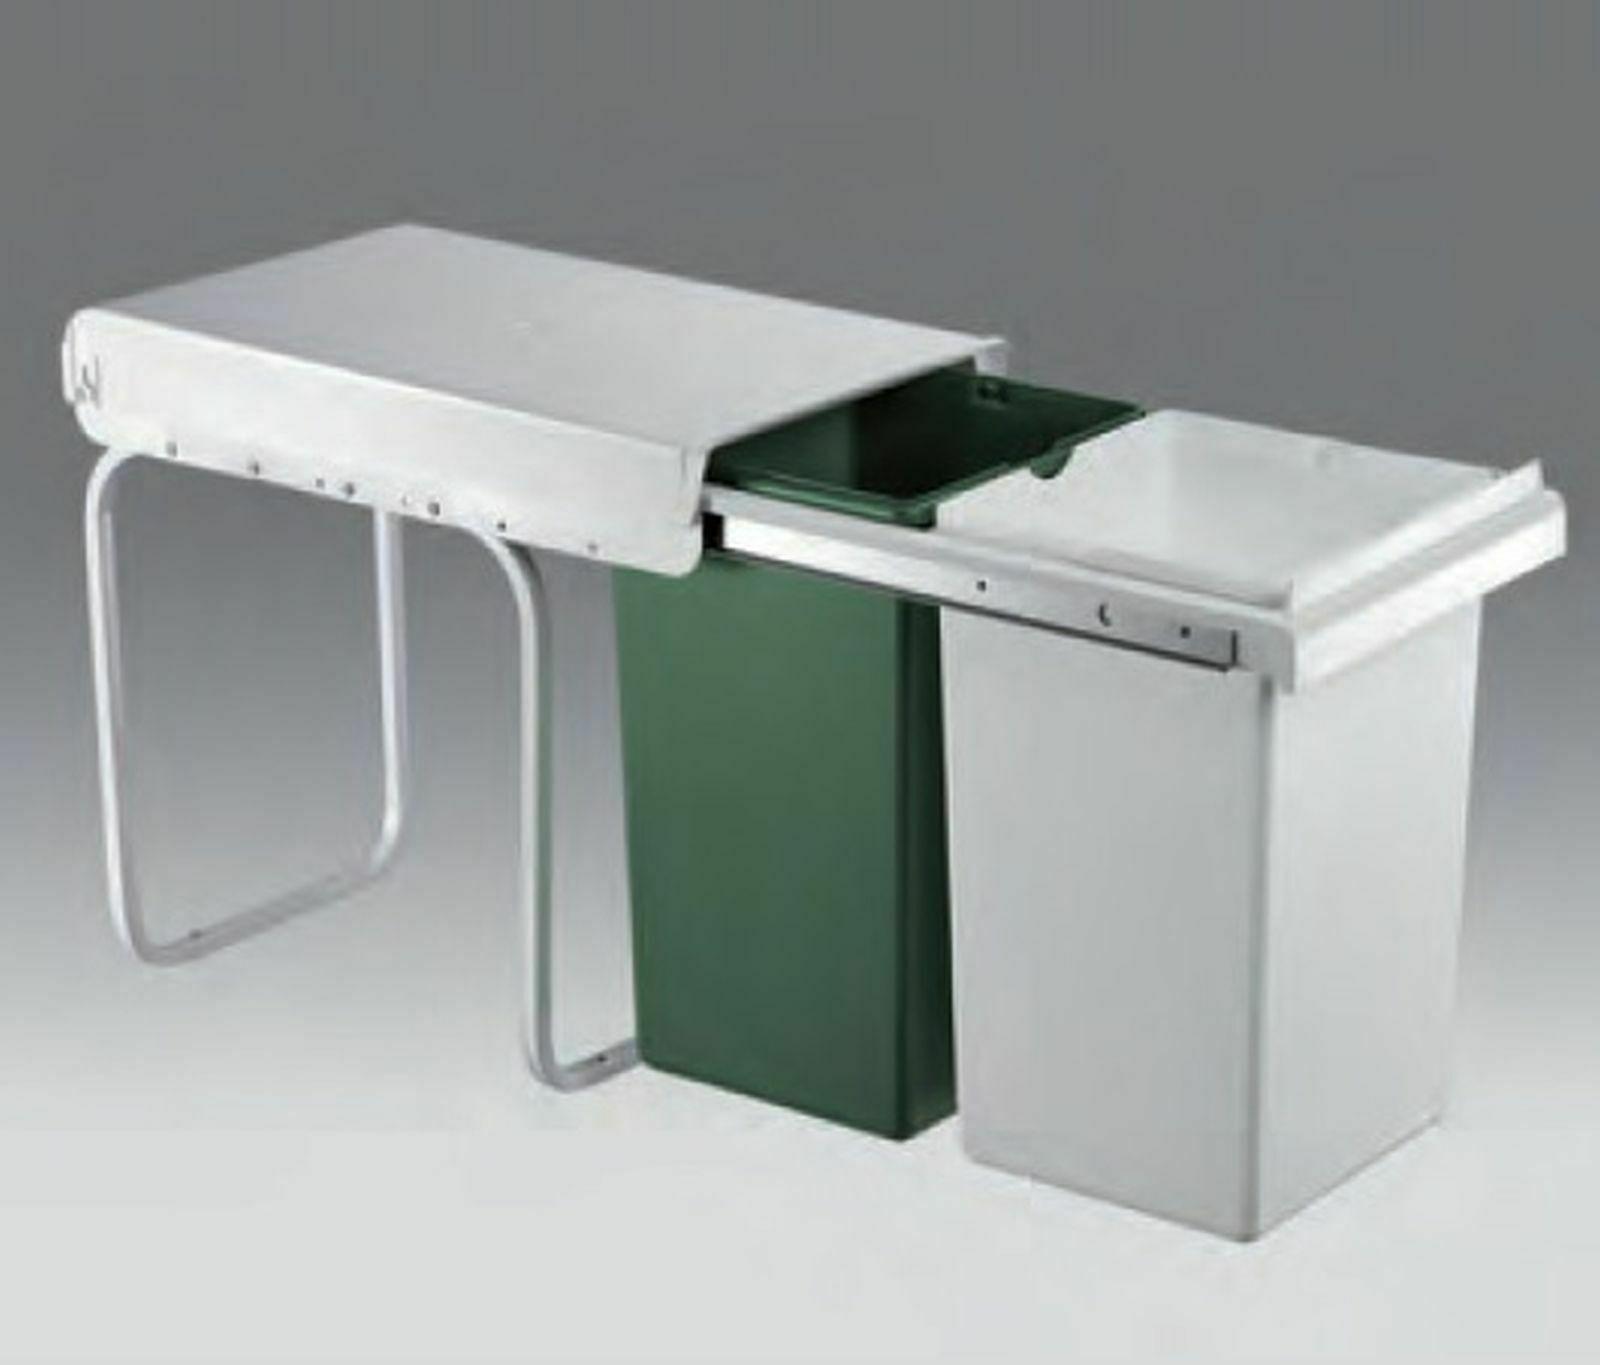 Full Size of 5e607af9c4c0b Müllsystem Küche Wohnzimmer Müllsystem